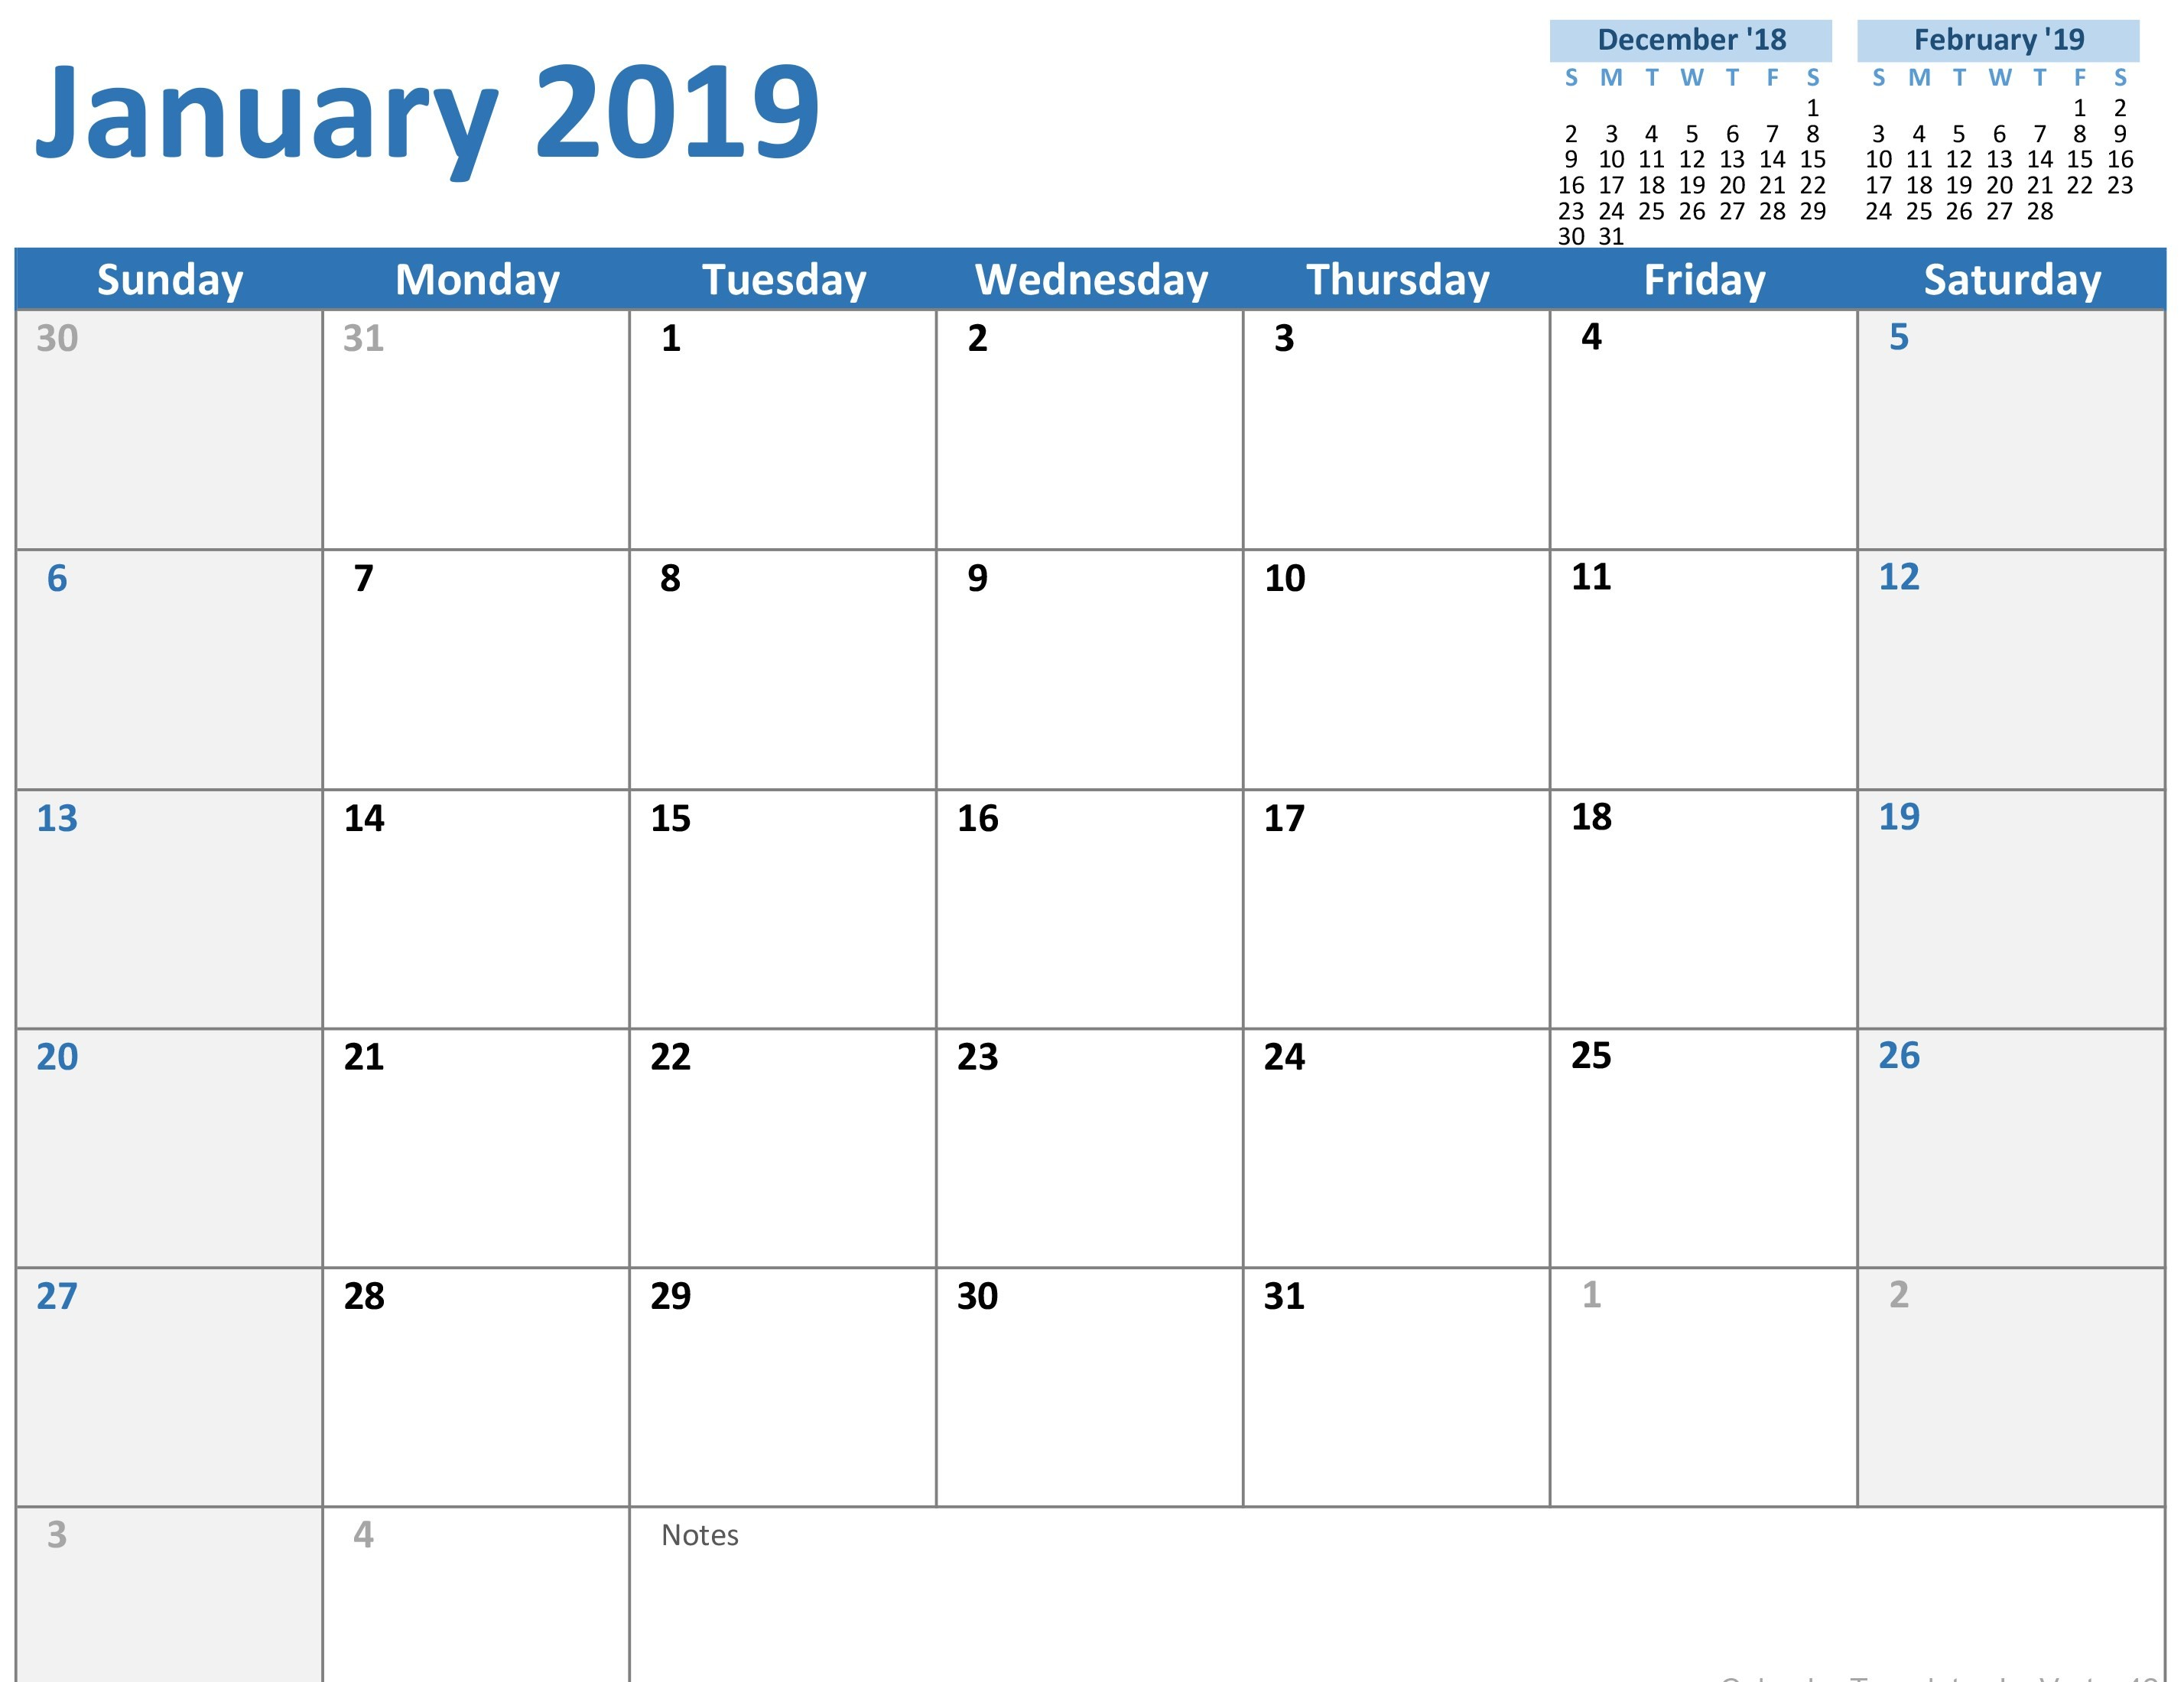 Calendar Template Free Printable 250 Free January 2019 Calendar Printable Templates